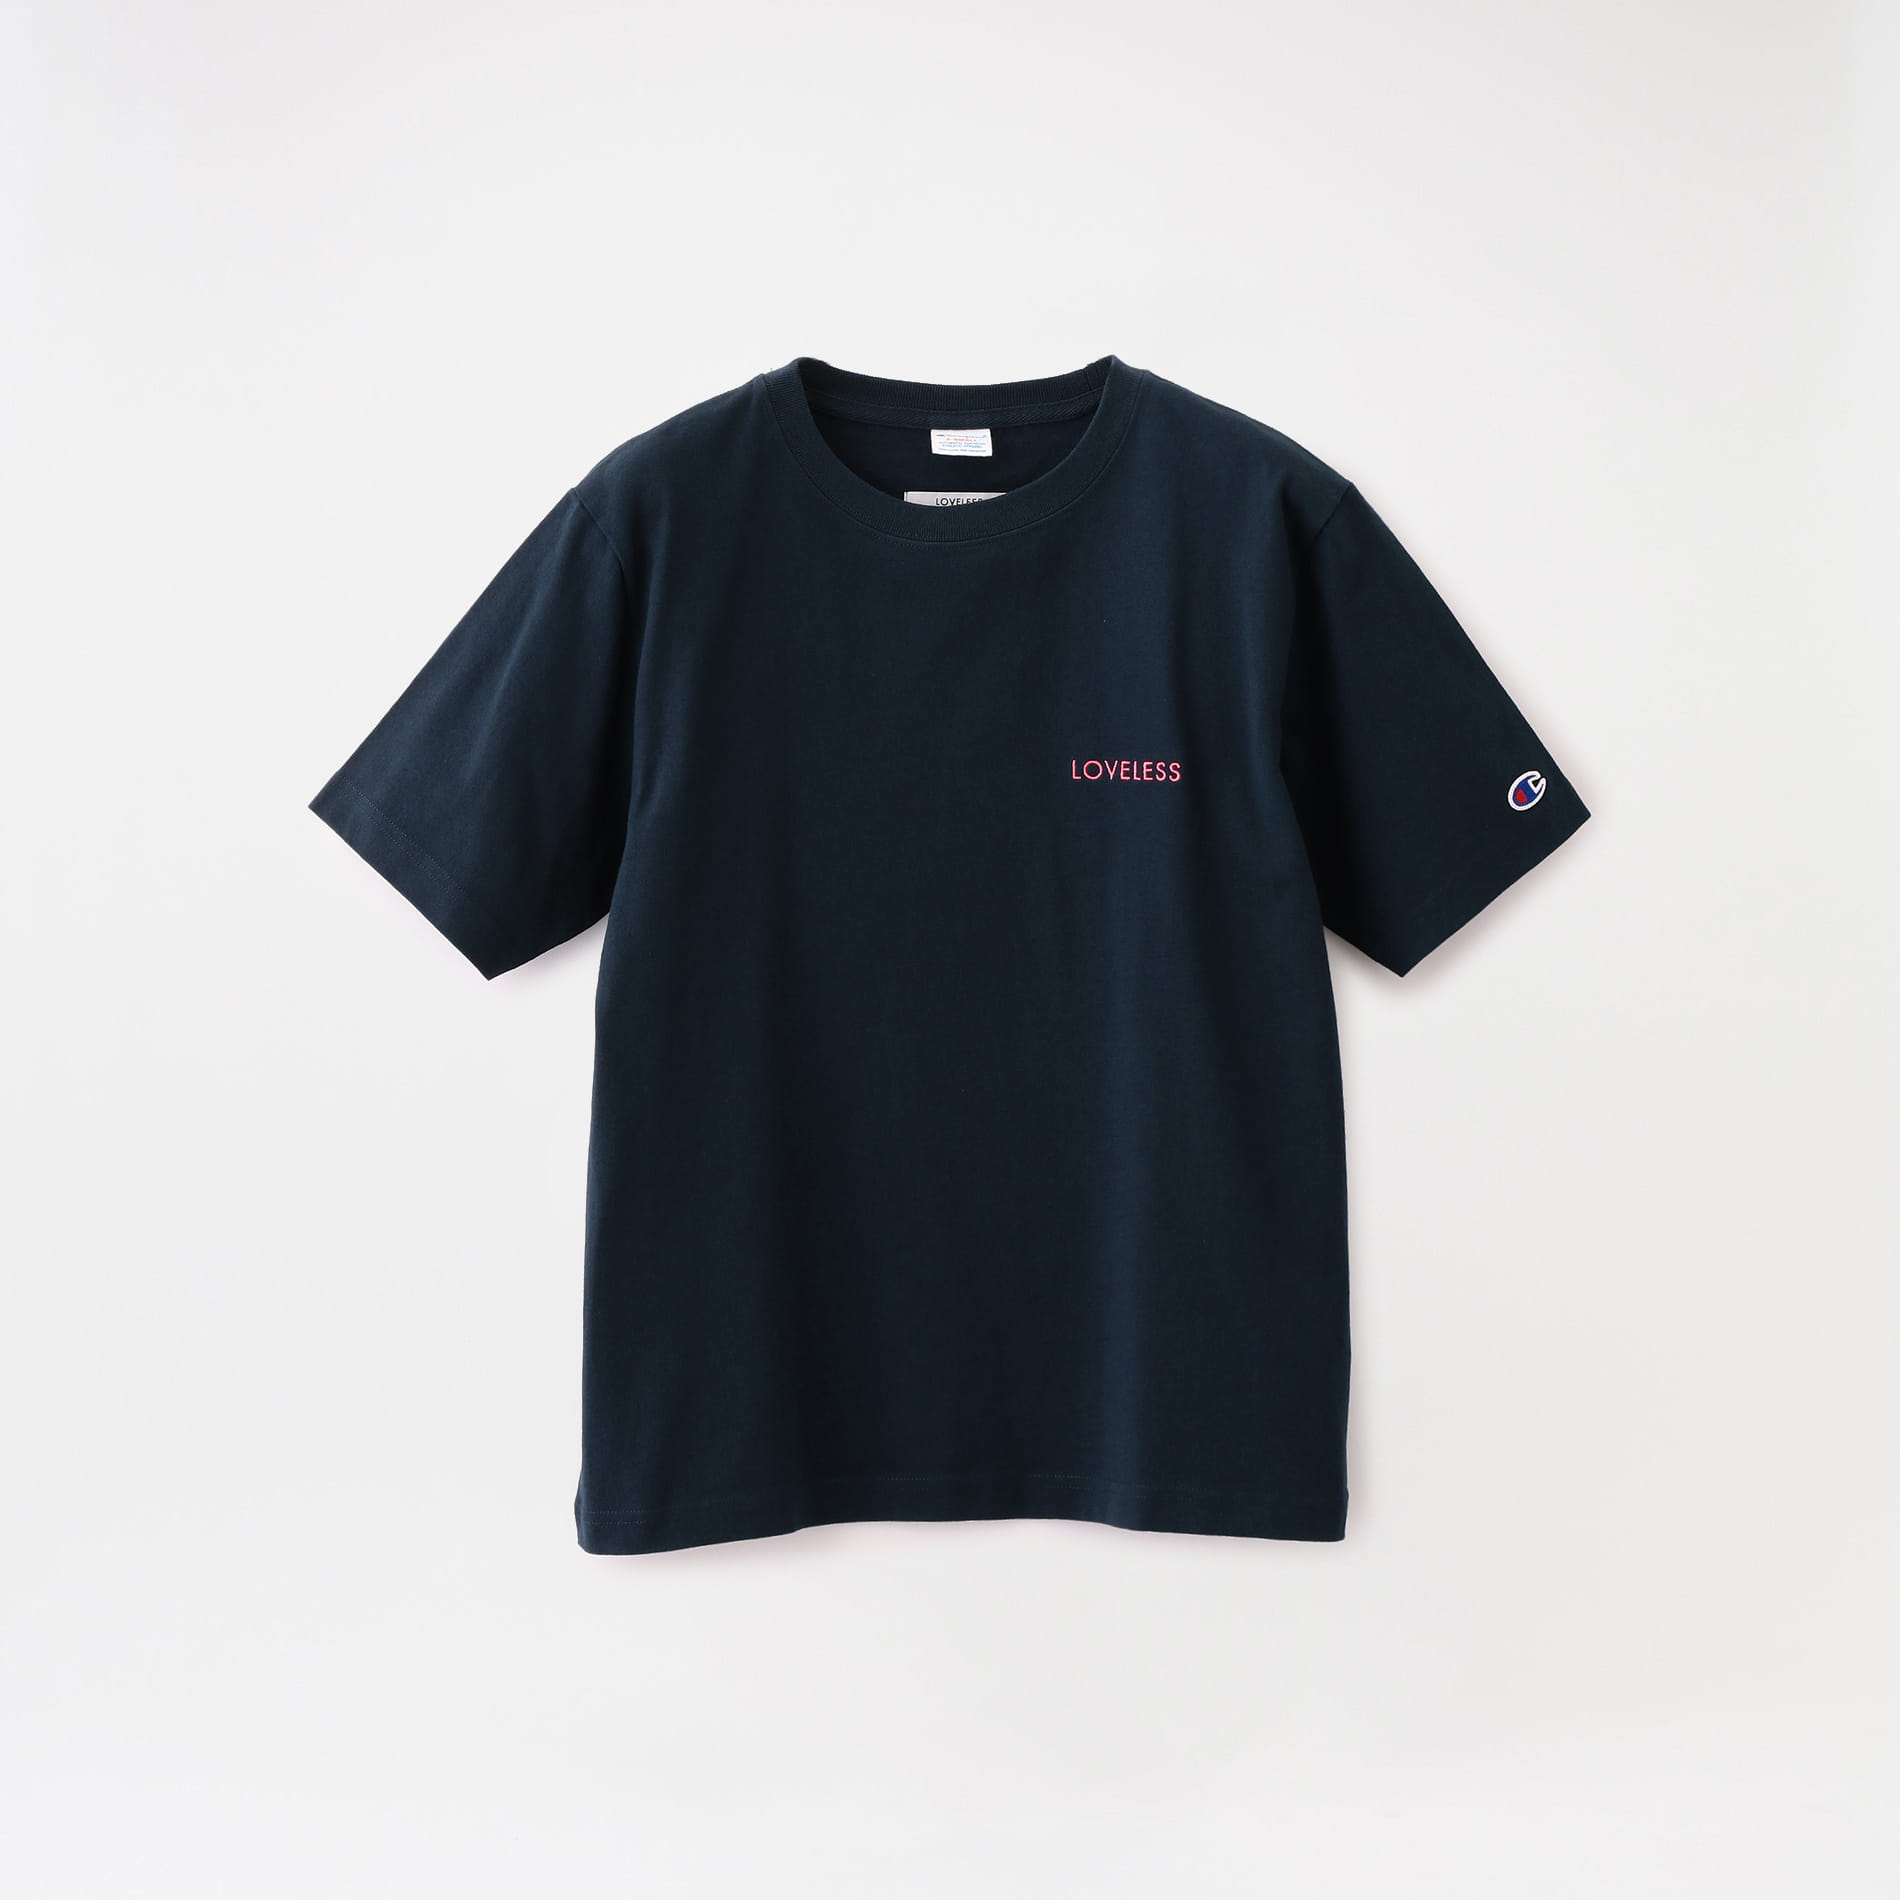 【Champion exclusive for LOVELESS】WOMEN 別注 エンブロイダリーロゴTシャツ